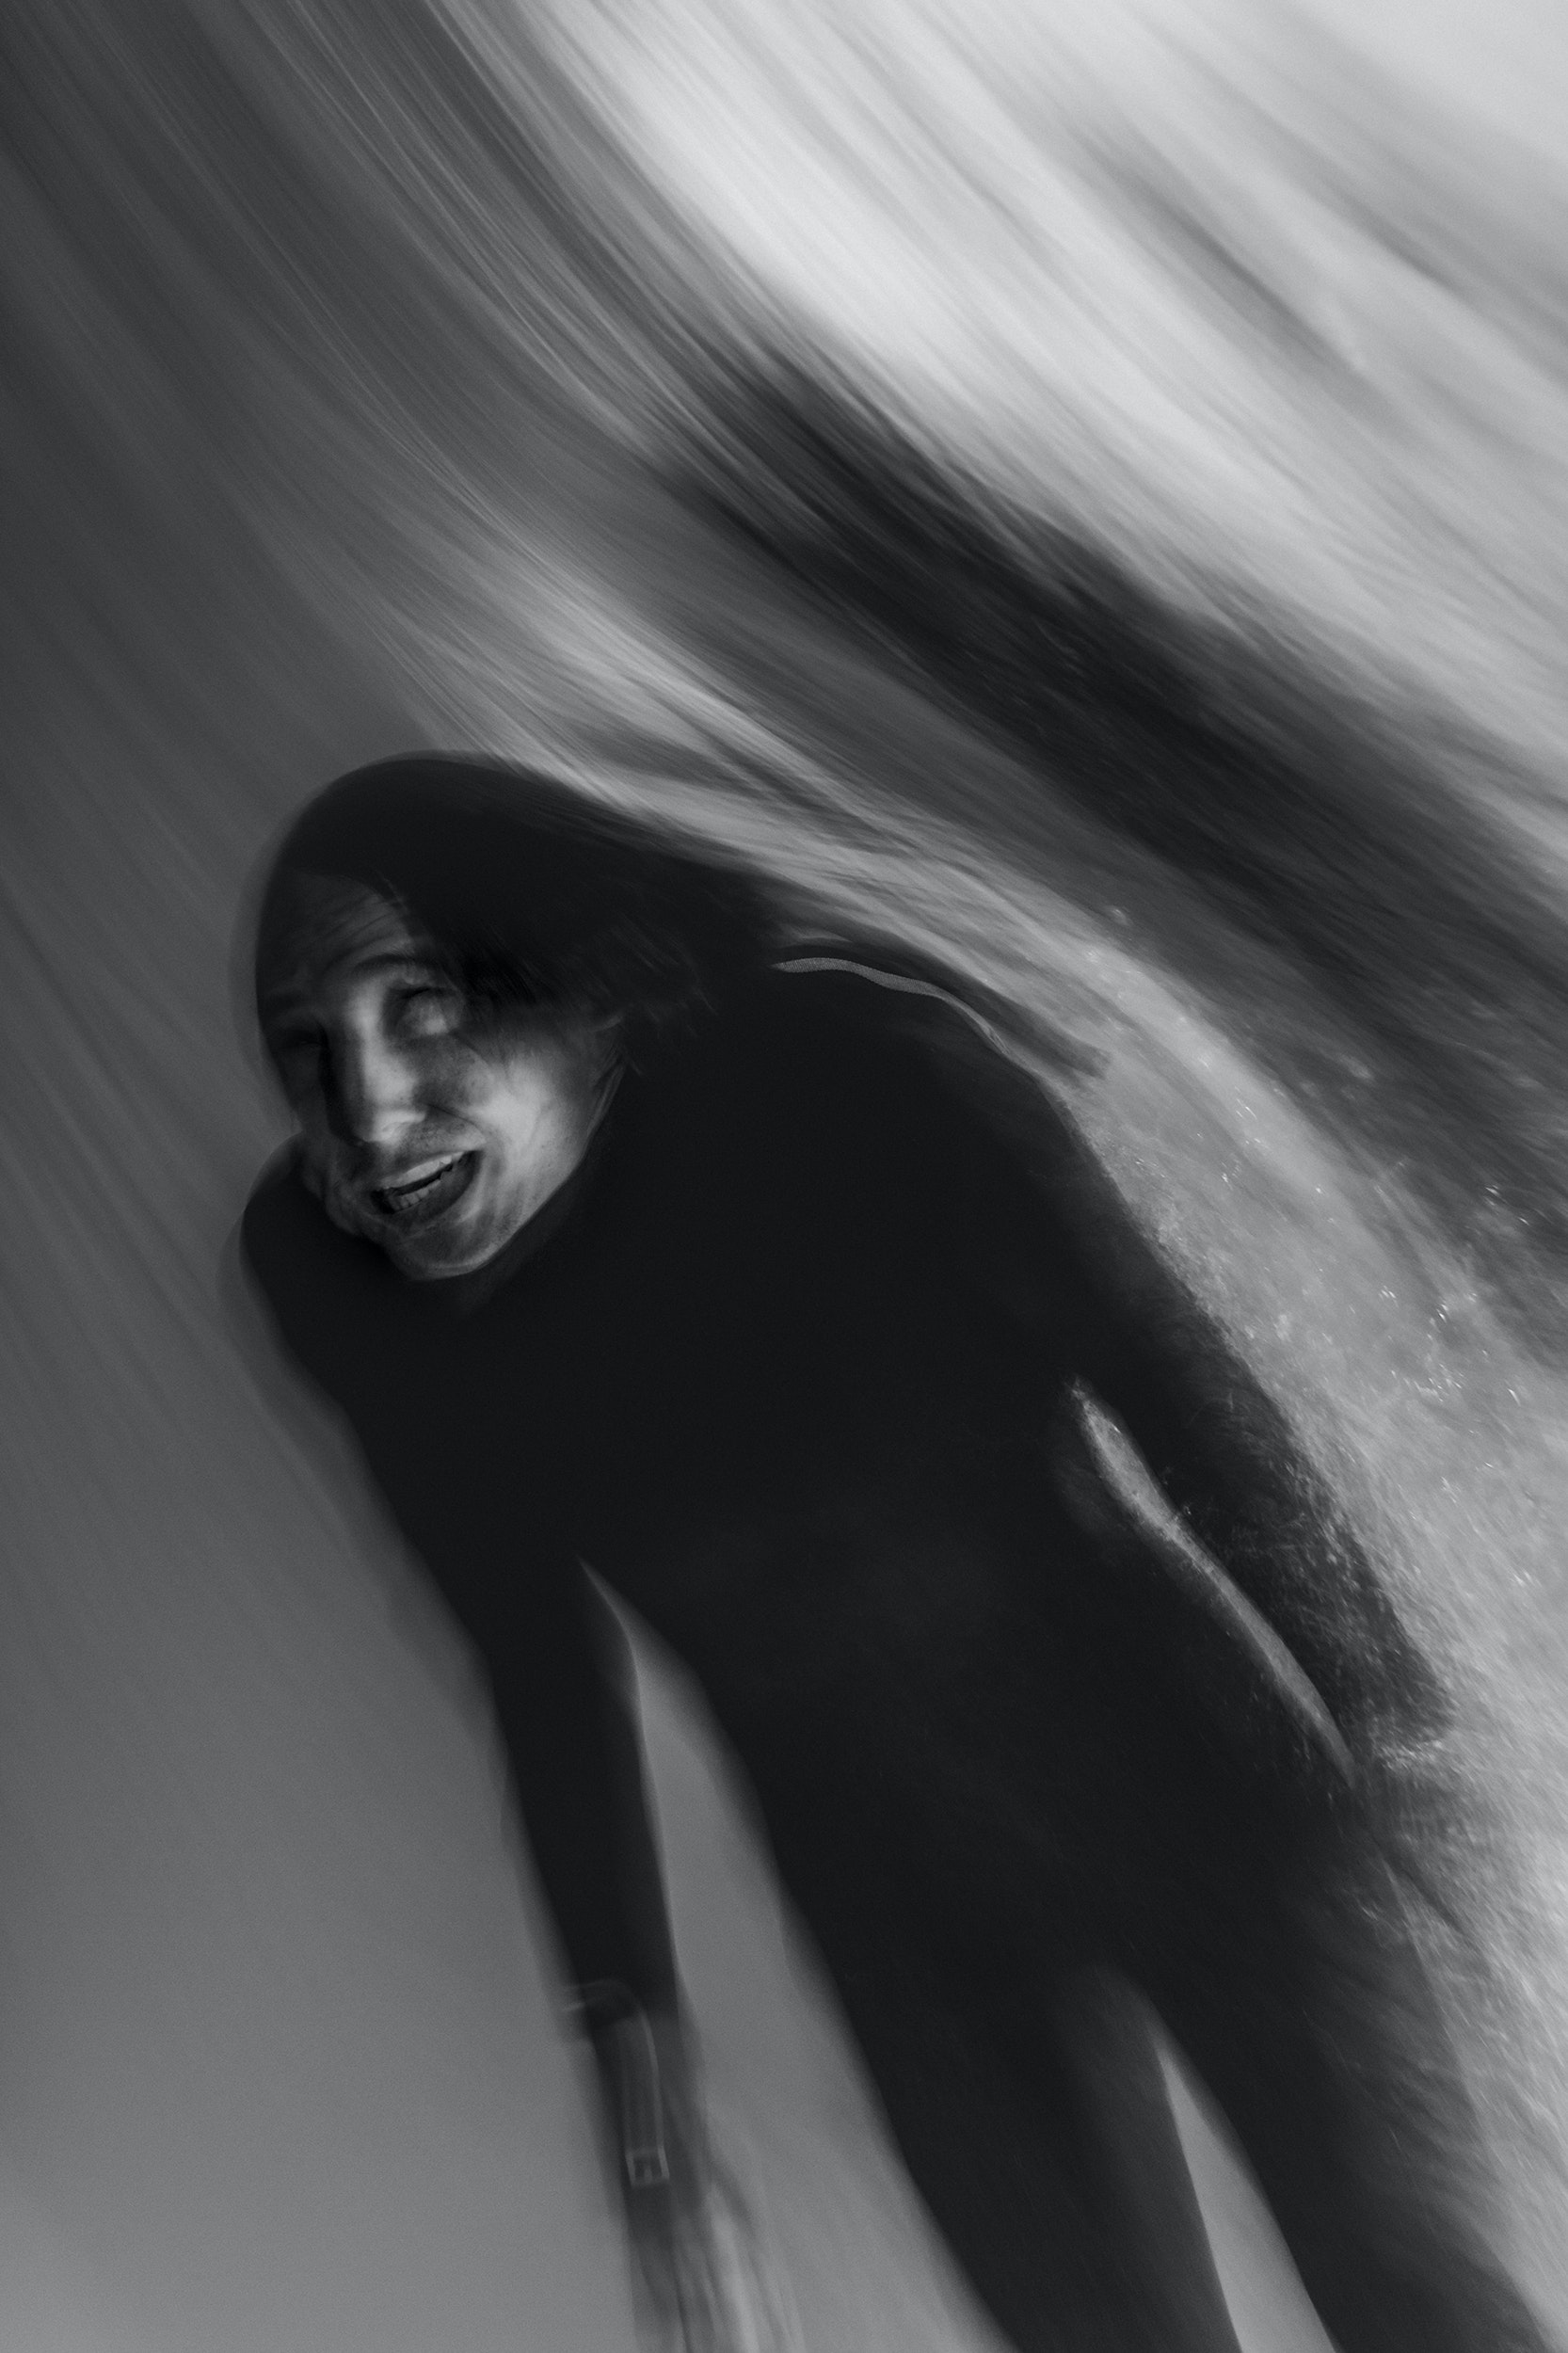 Jack MaCrae by Trent Mitchell